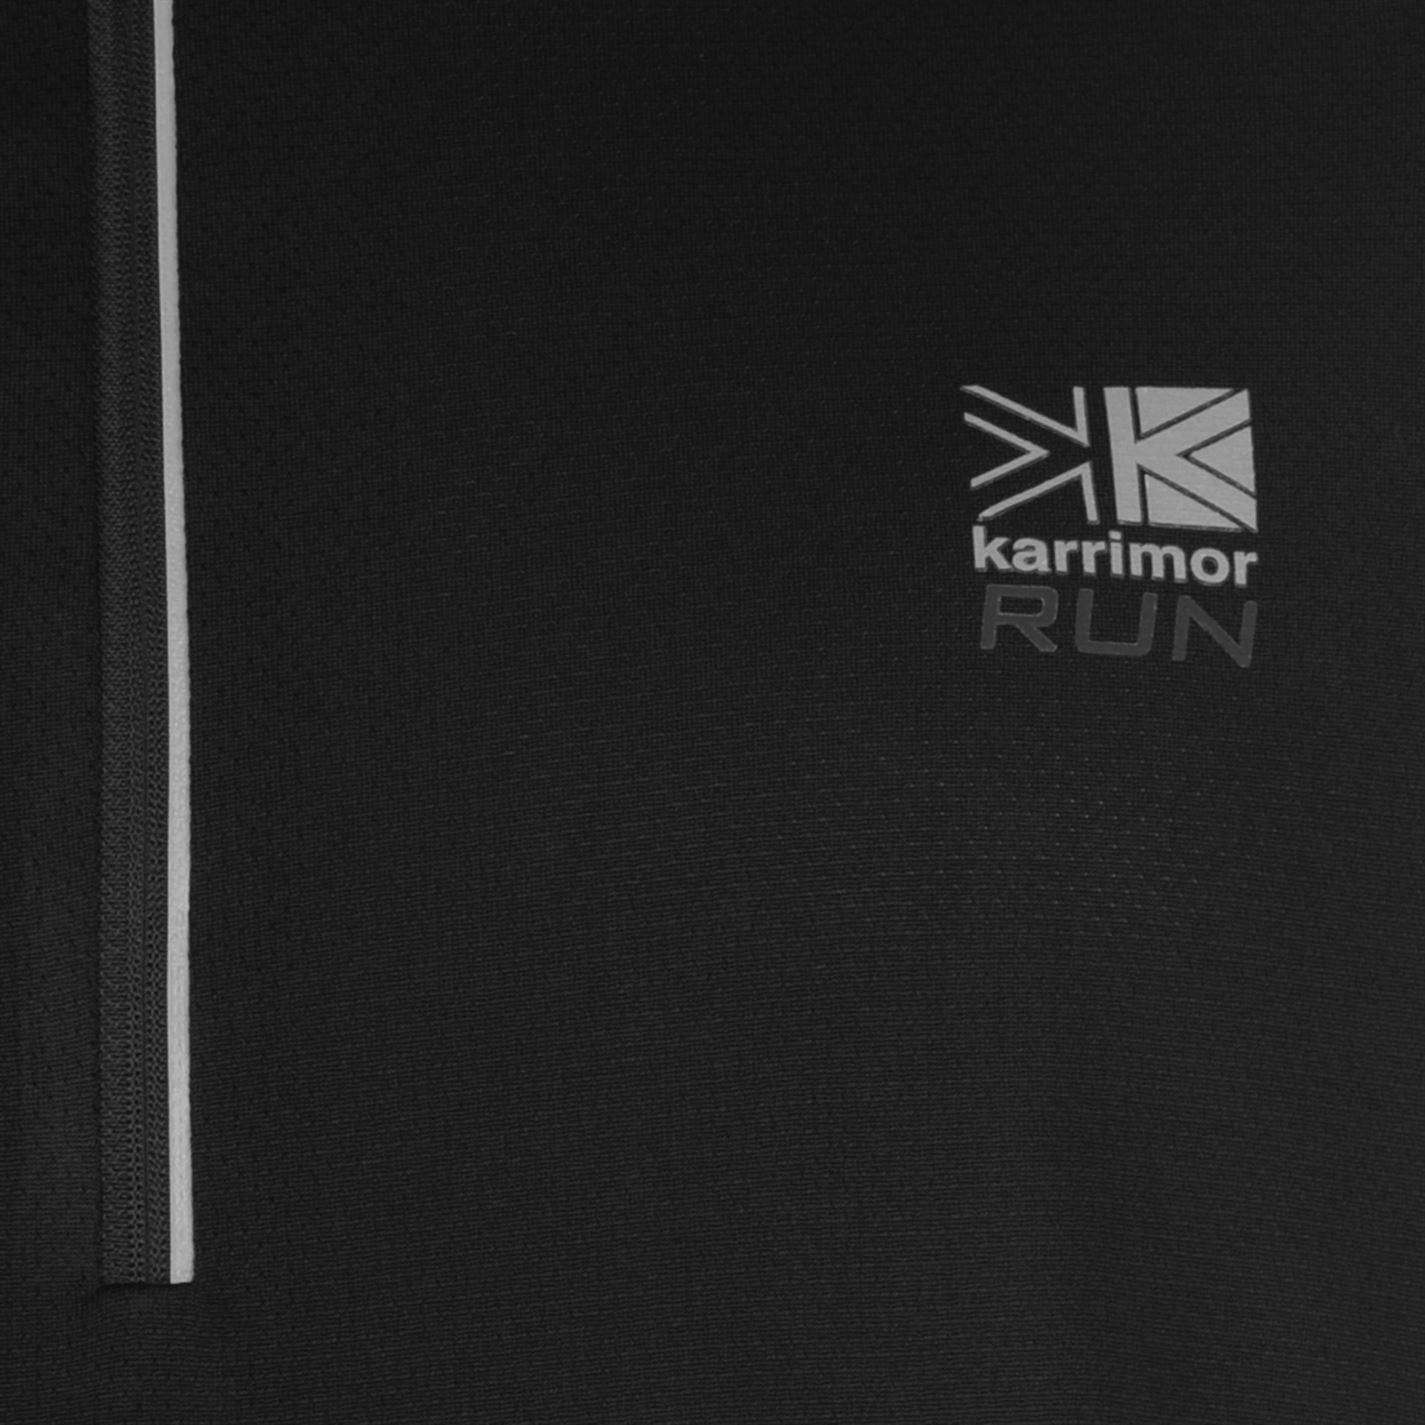 Karrimor-Correr-Mens-X-Cremallera-Camiseta-Camiseta-Top-Transpirable-Ligero-Mentonera miniatura 10